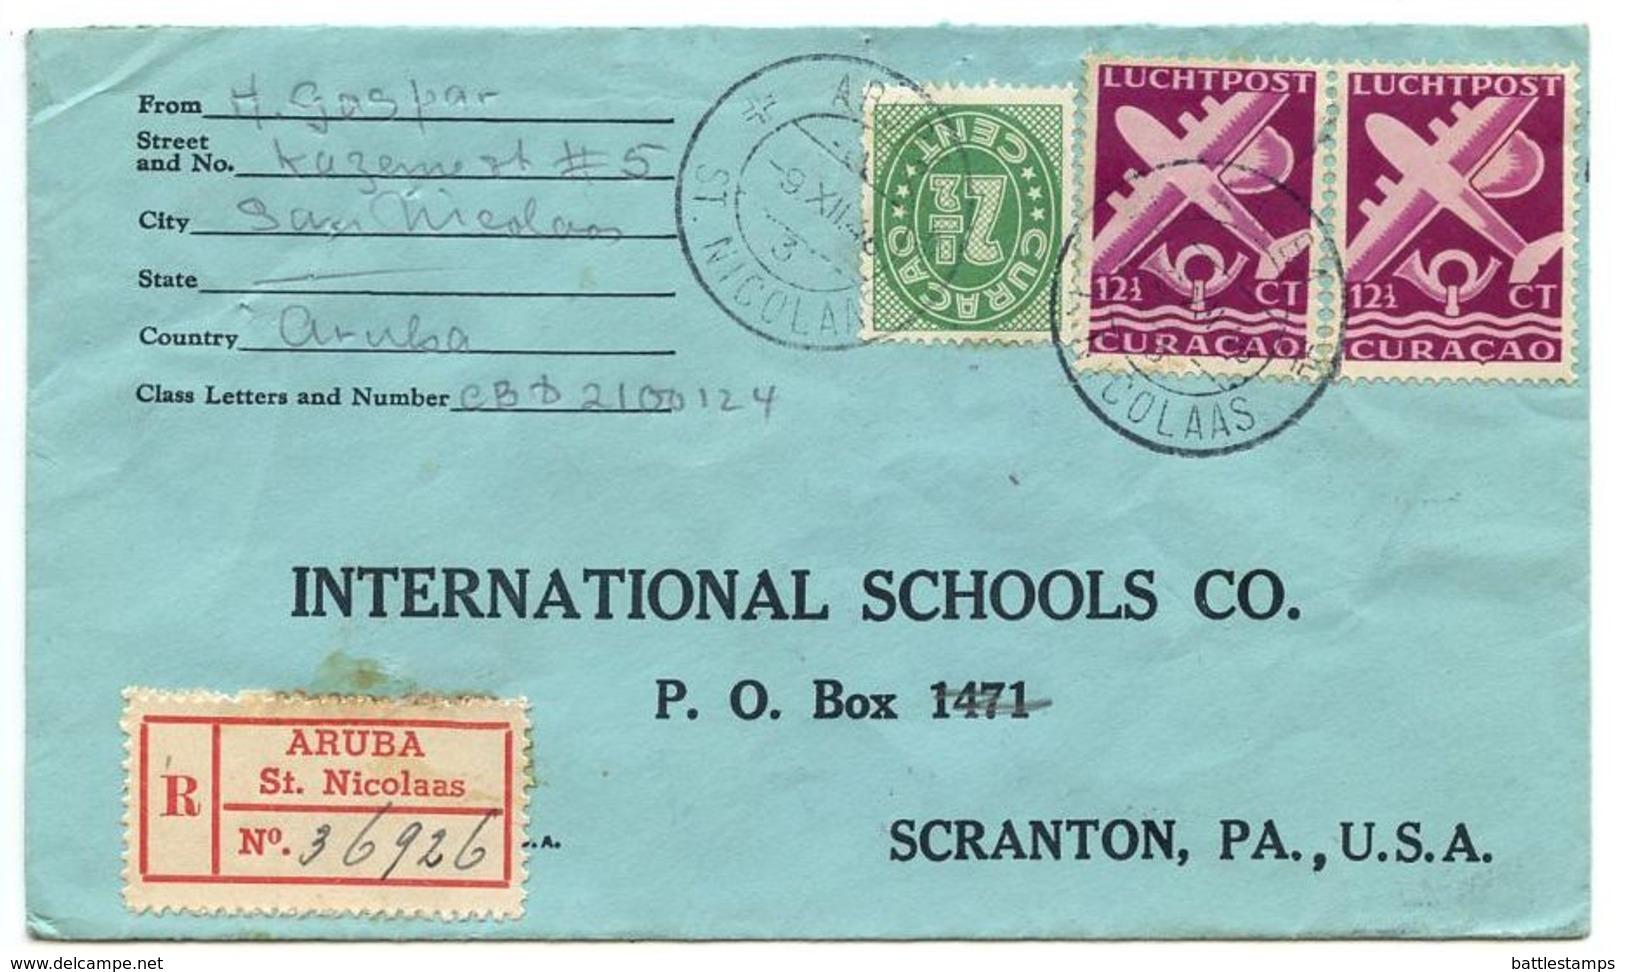 Netherlands Antilles 1948 Registered Cover Aruba, St. Nicolaas To U.S. W/ Scott 150 & C33A - Curaçao, Antilles Neérlandaises, Aruba